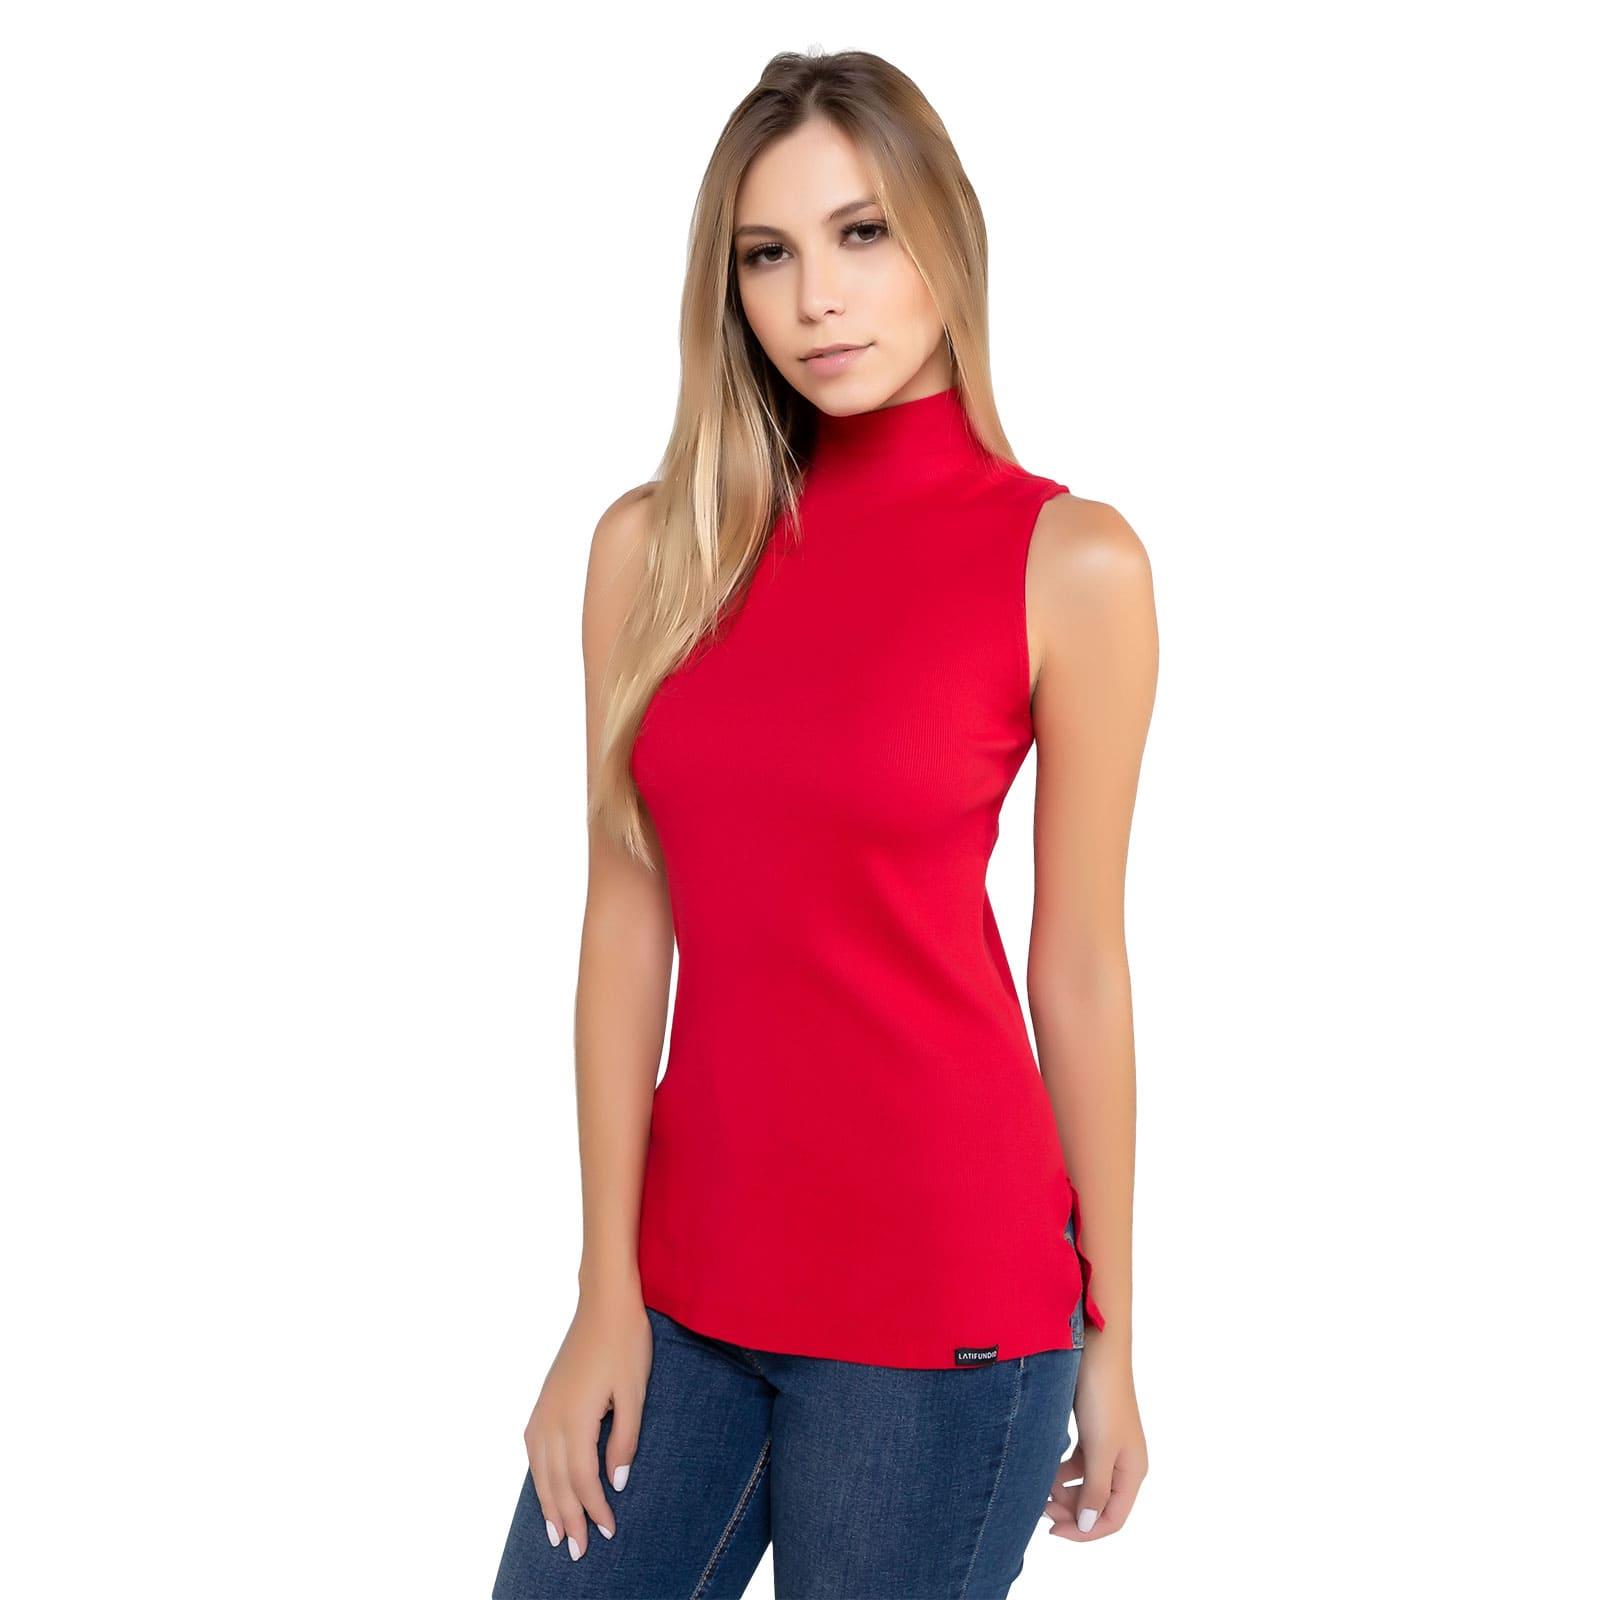 Blusa Feminina Gola Alta Vermelho